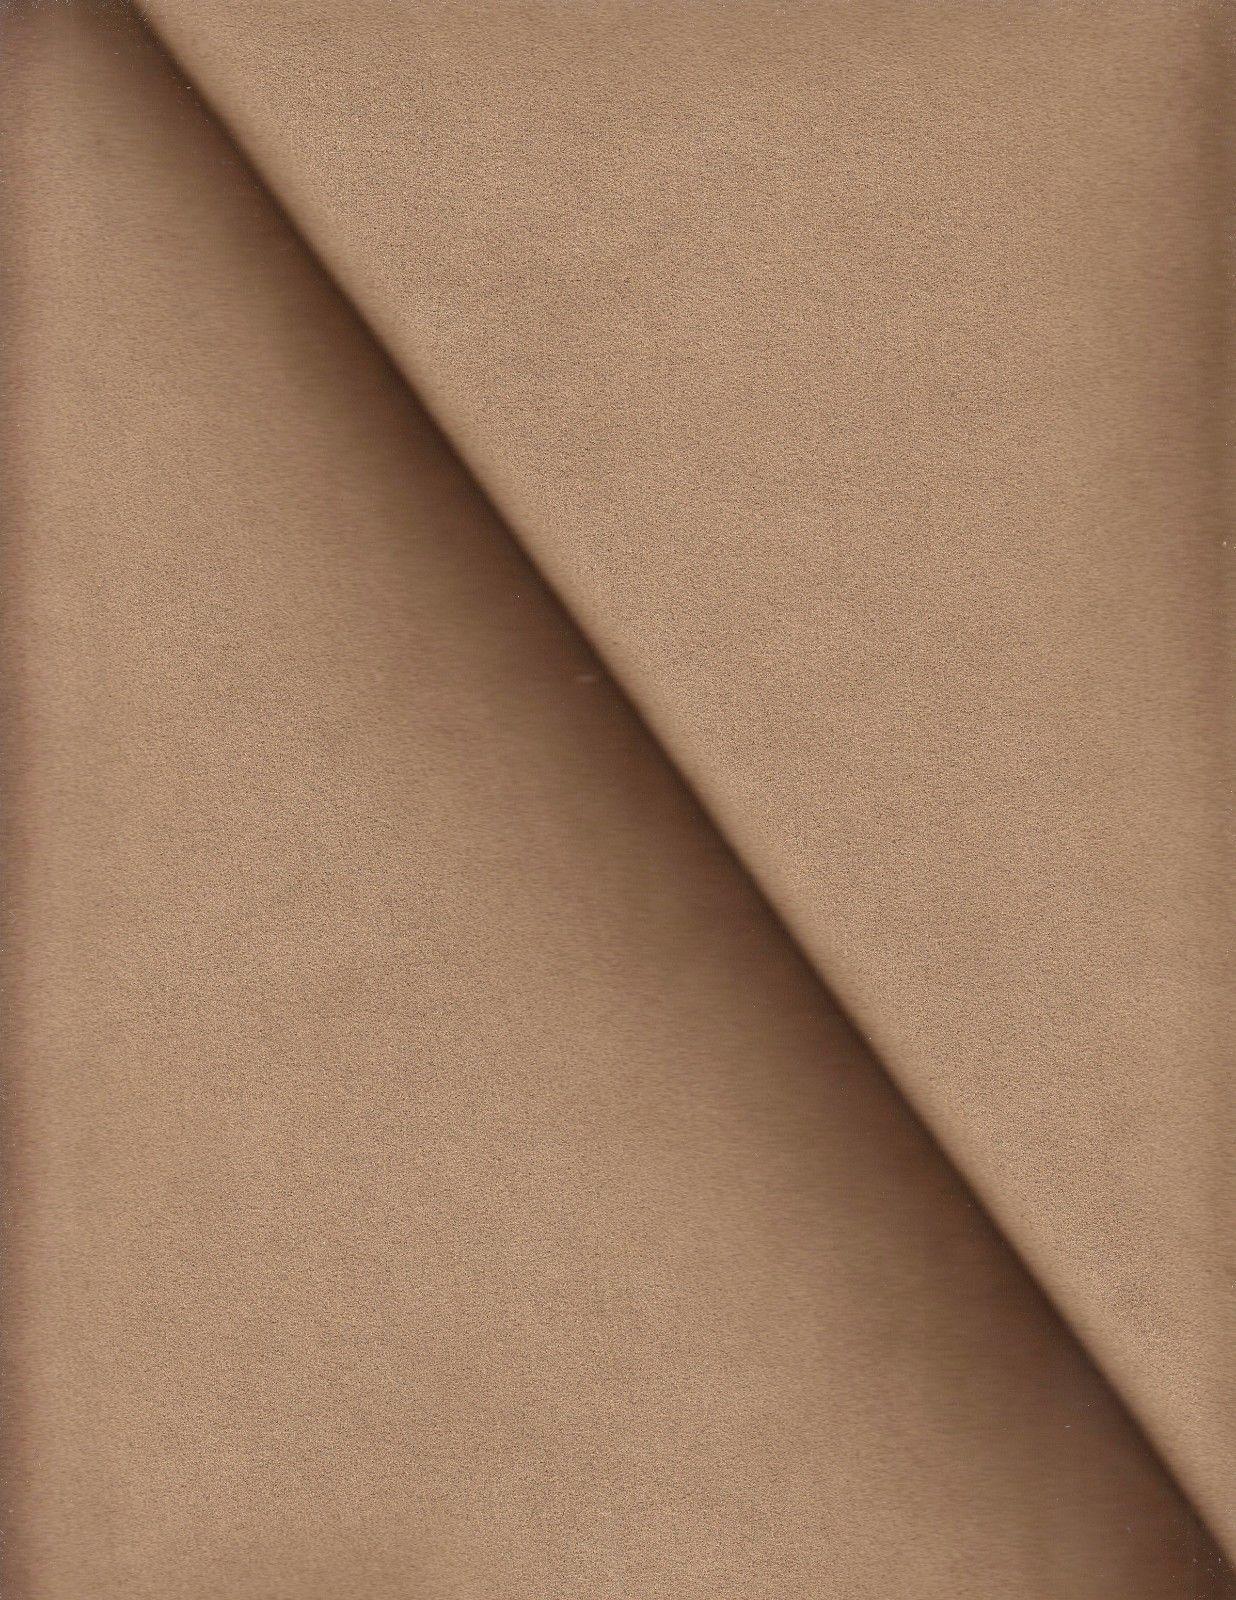 Toray Finta pelle Scamosciata Tappezzeria Ultrasuede Ambiente Marrone 4.8m Ej